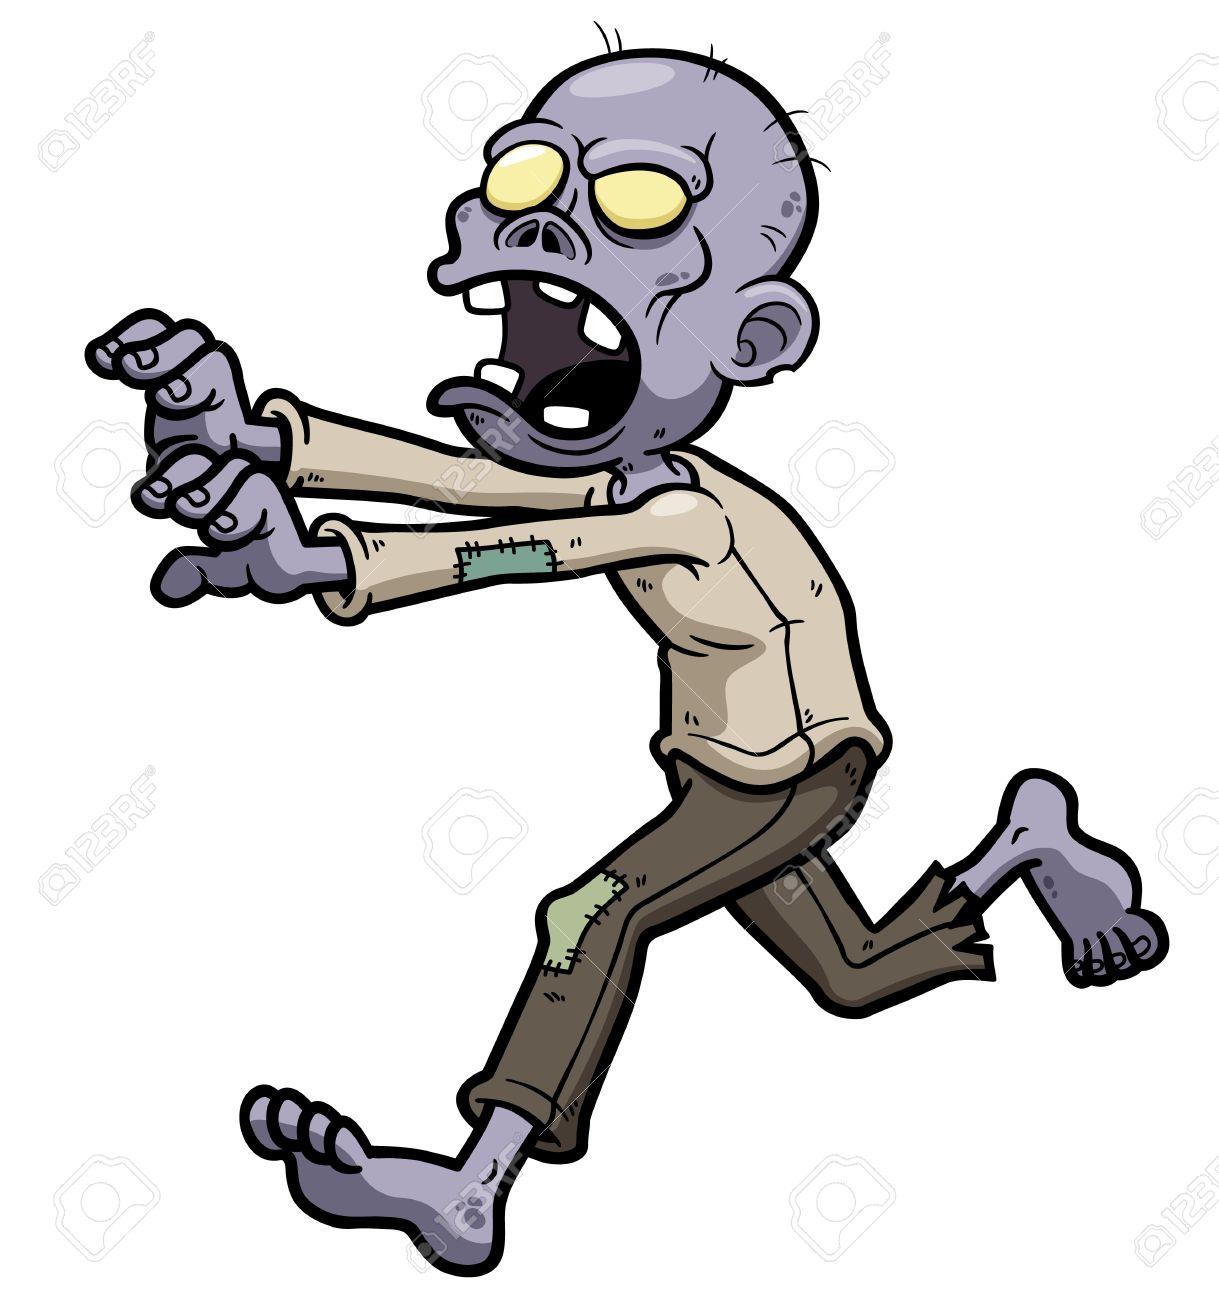 1219x1300 Vector Illustration Of Cartoon Zombie Royalty Free Cliparts